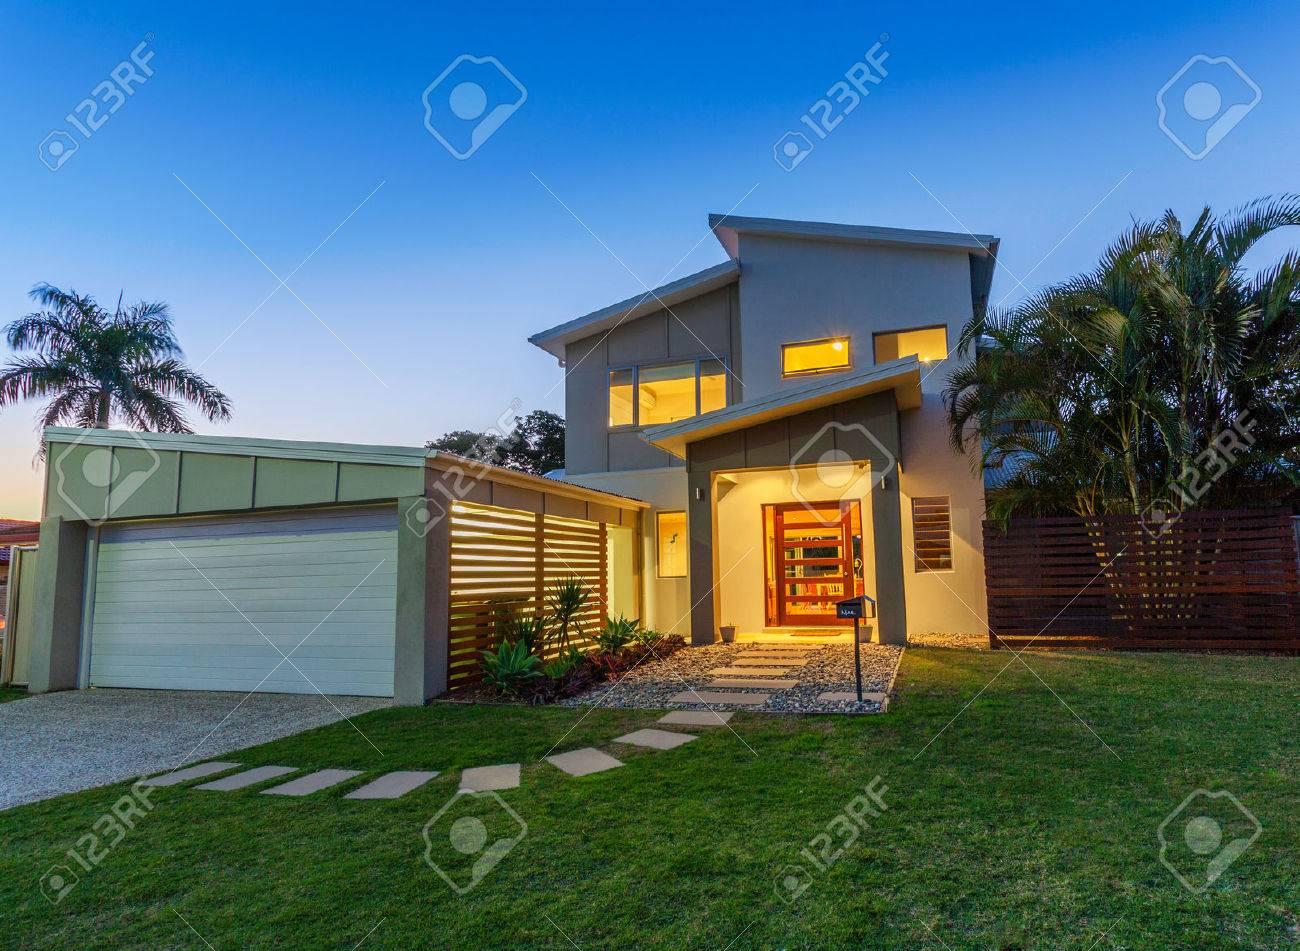 Modern australian home front at dusk Standard-Bild - 30774454